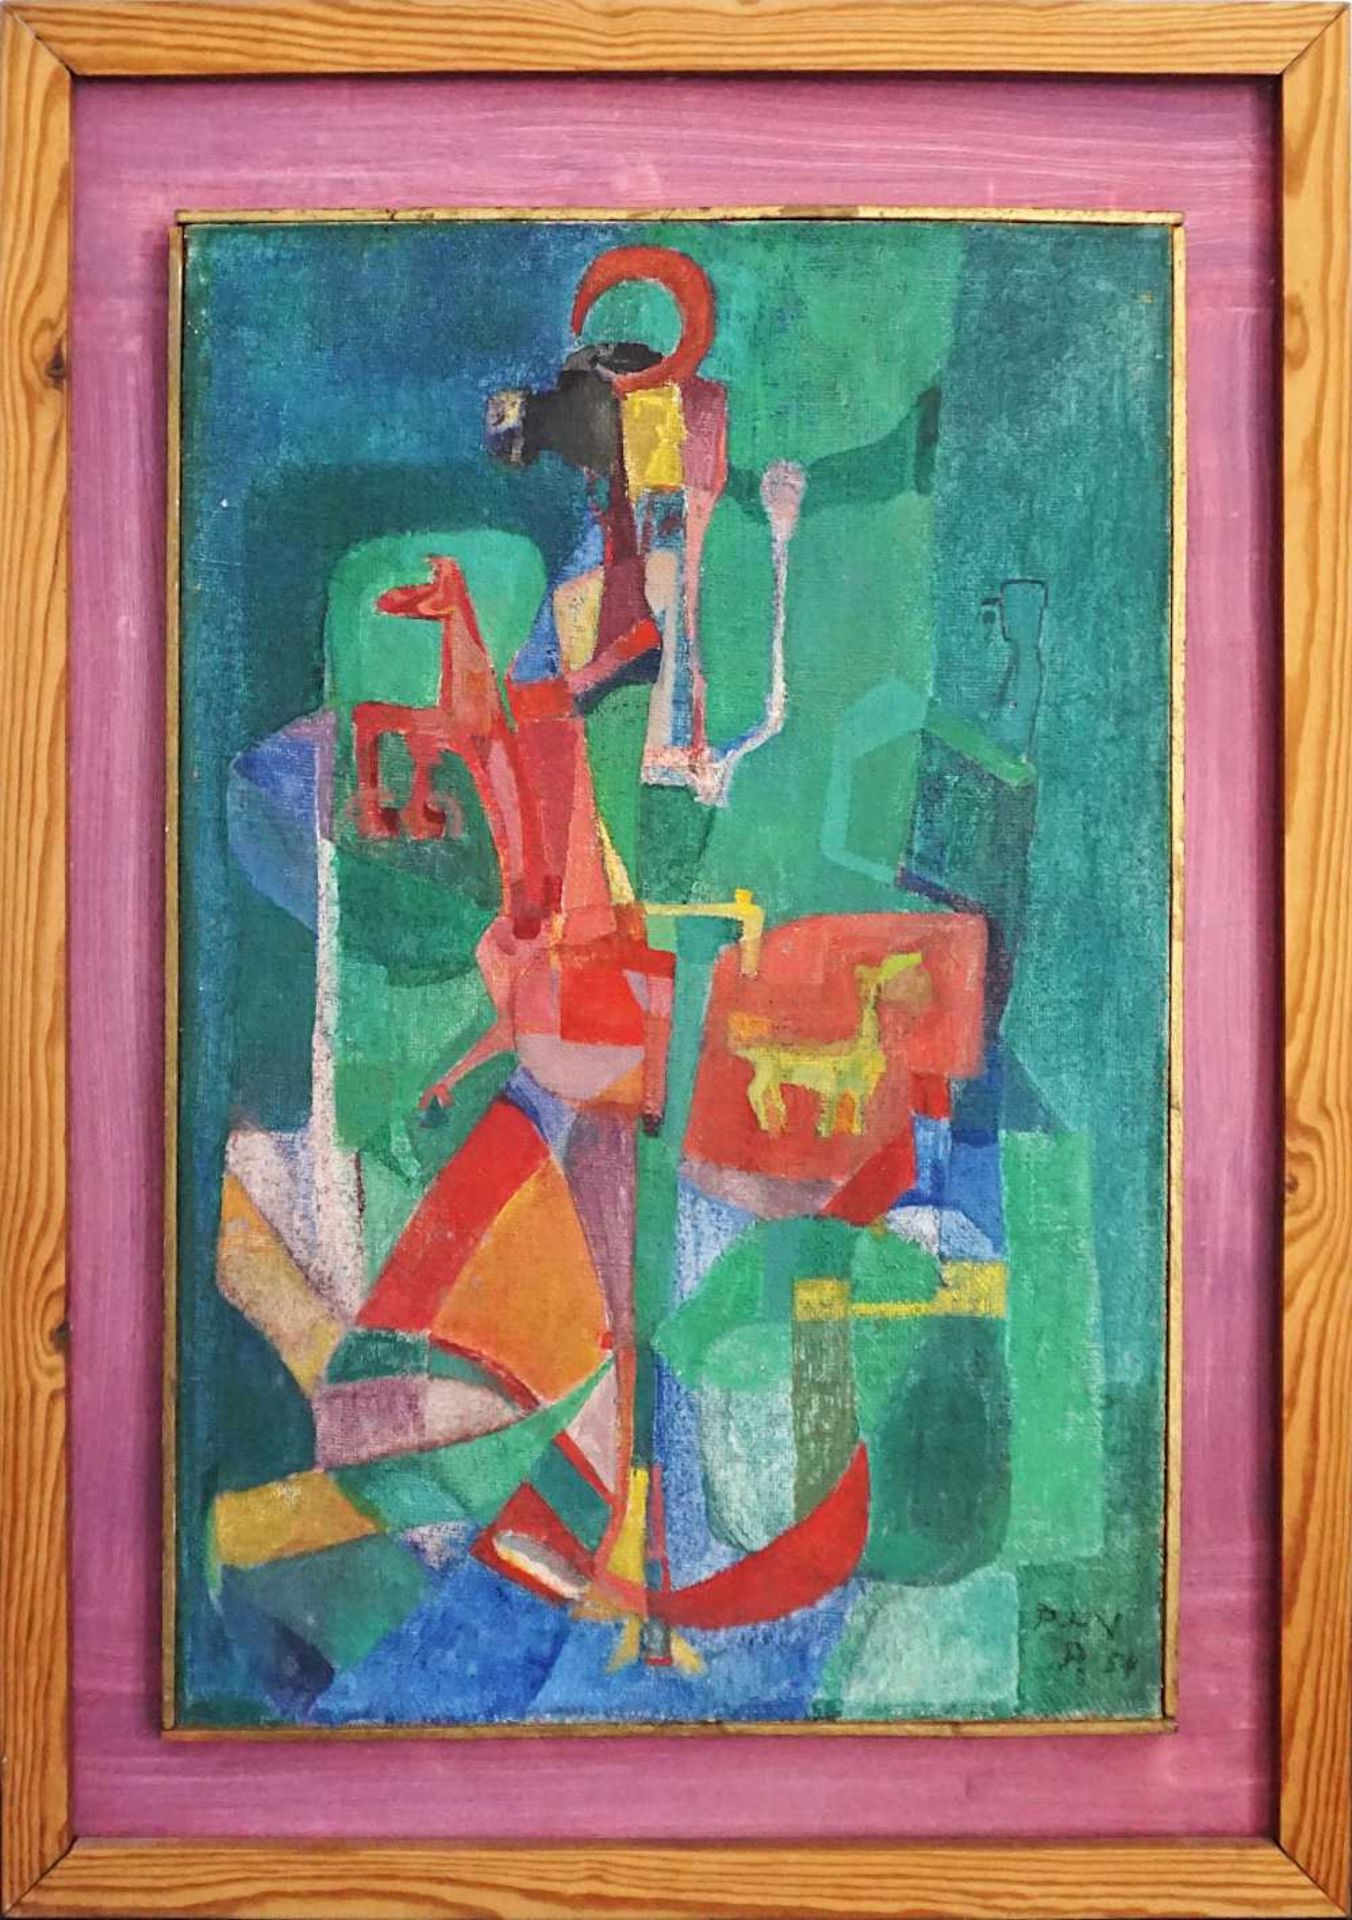 "1 Ölgemälde ""Inanna"" R.u. monogr. PHN (wohl Paul Heinreich NODNAGEL 1928-2009) dat."